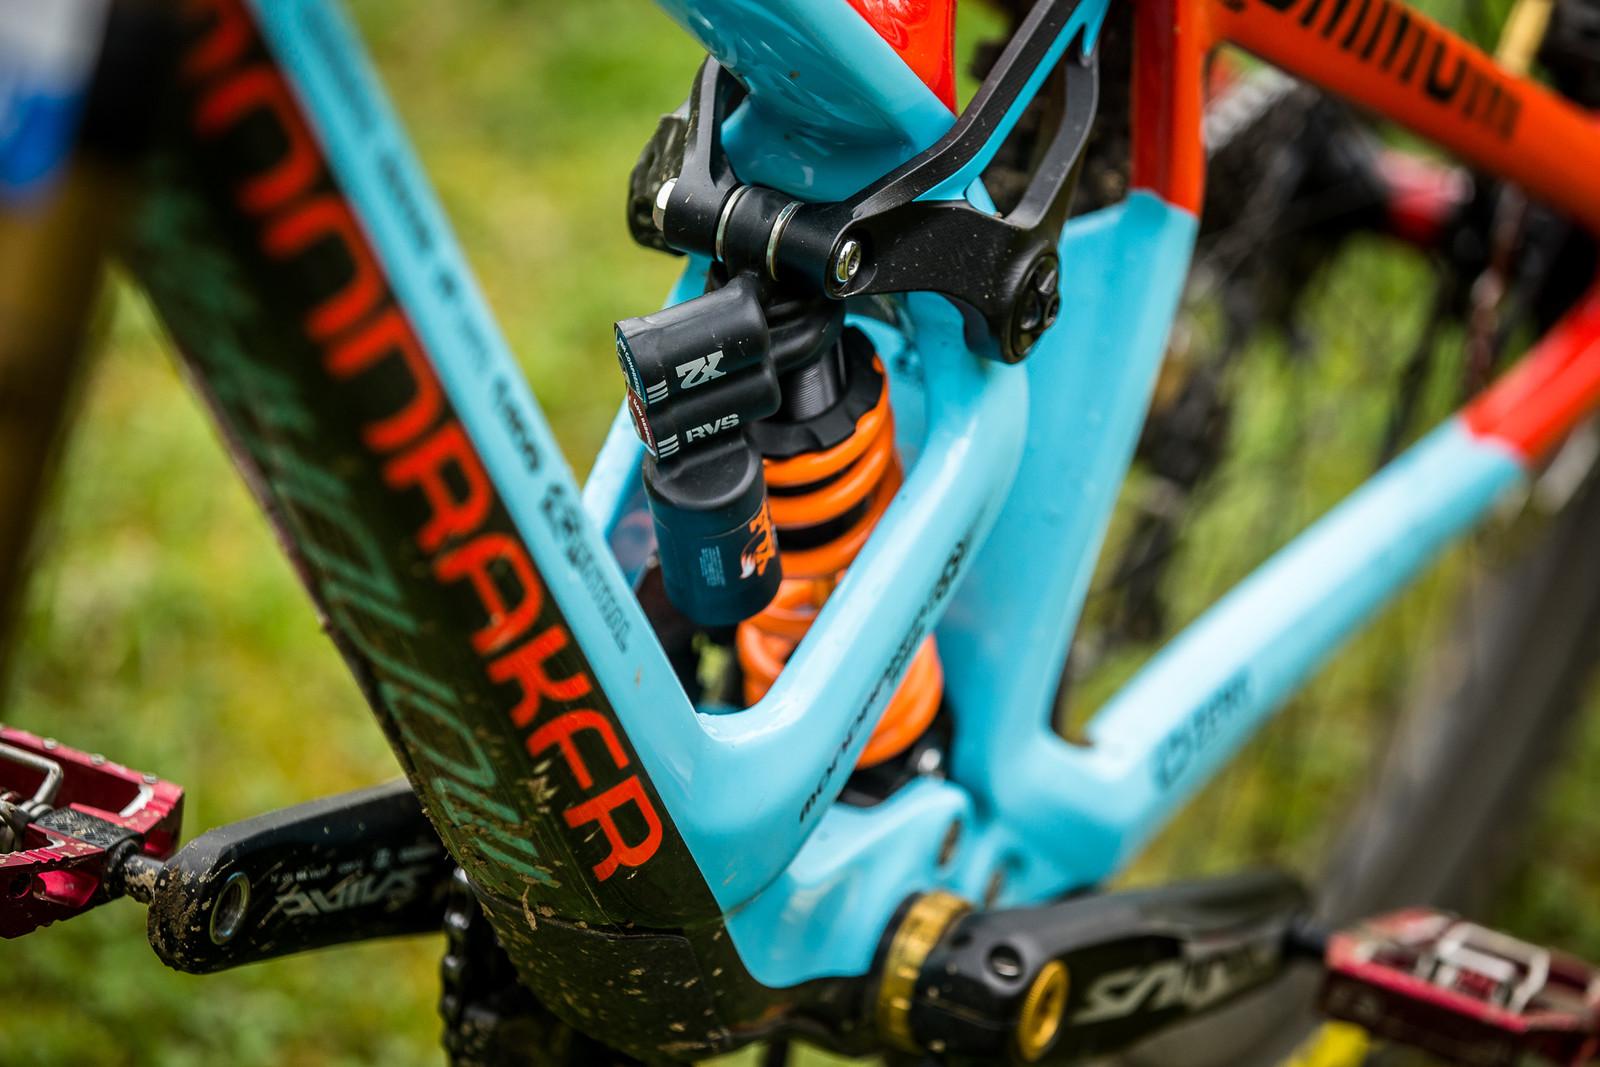 FOX DHX2 Rear Shock - WINNING BIKE - Laurie Greenland's Mondraker Summum - Mountain Biking Pictures - Vital MTB